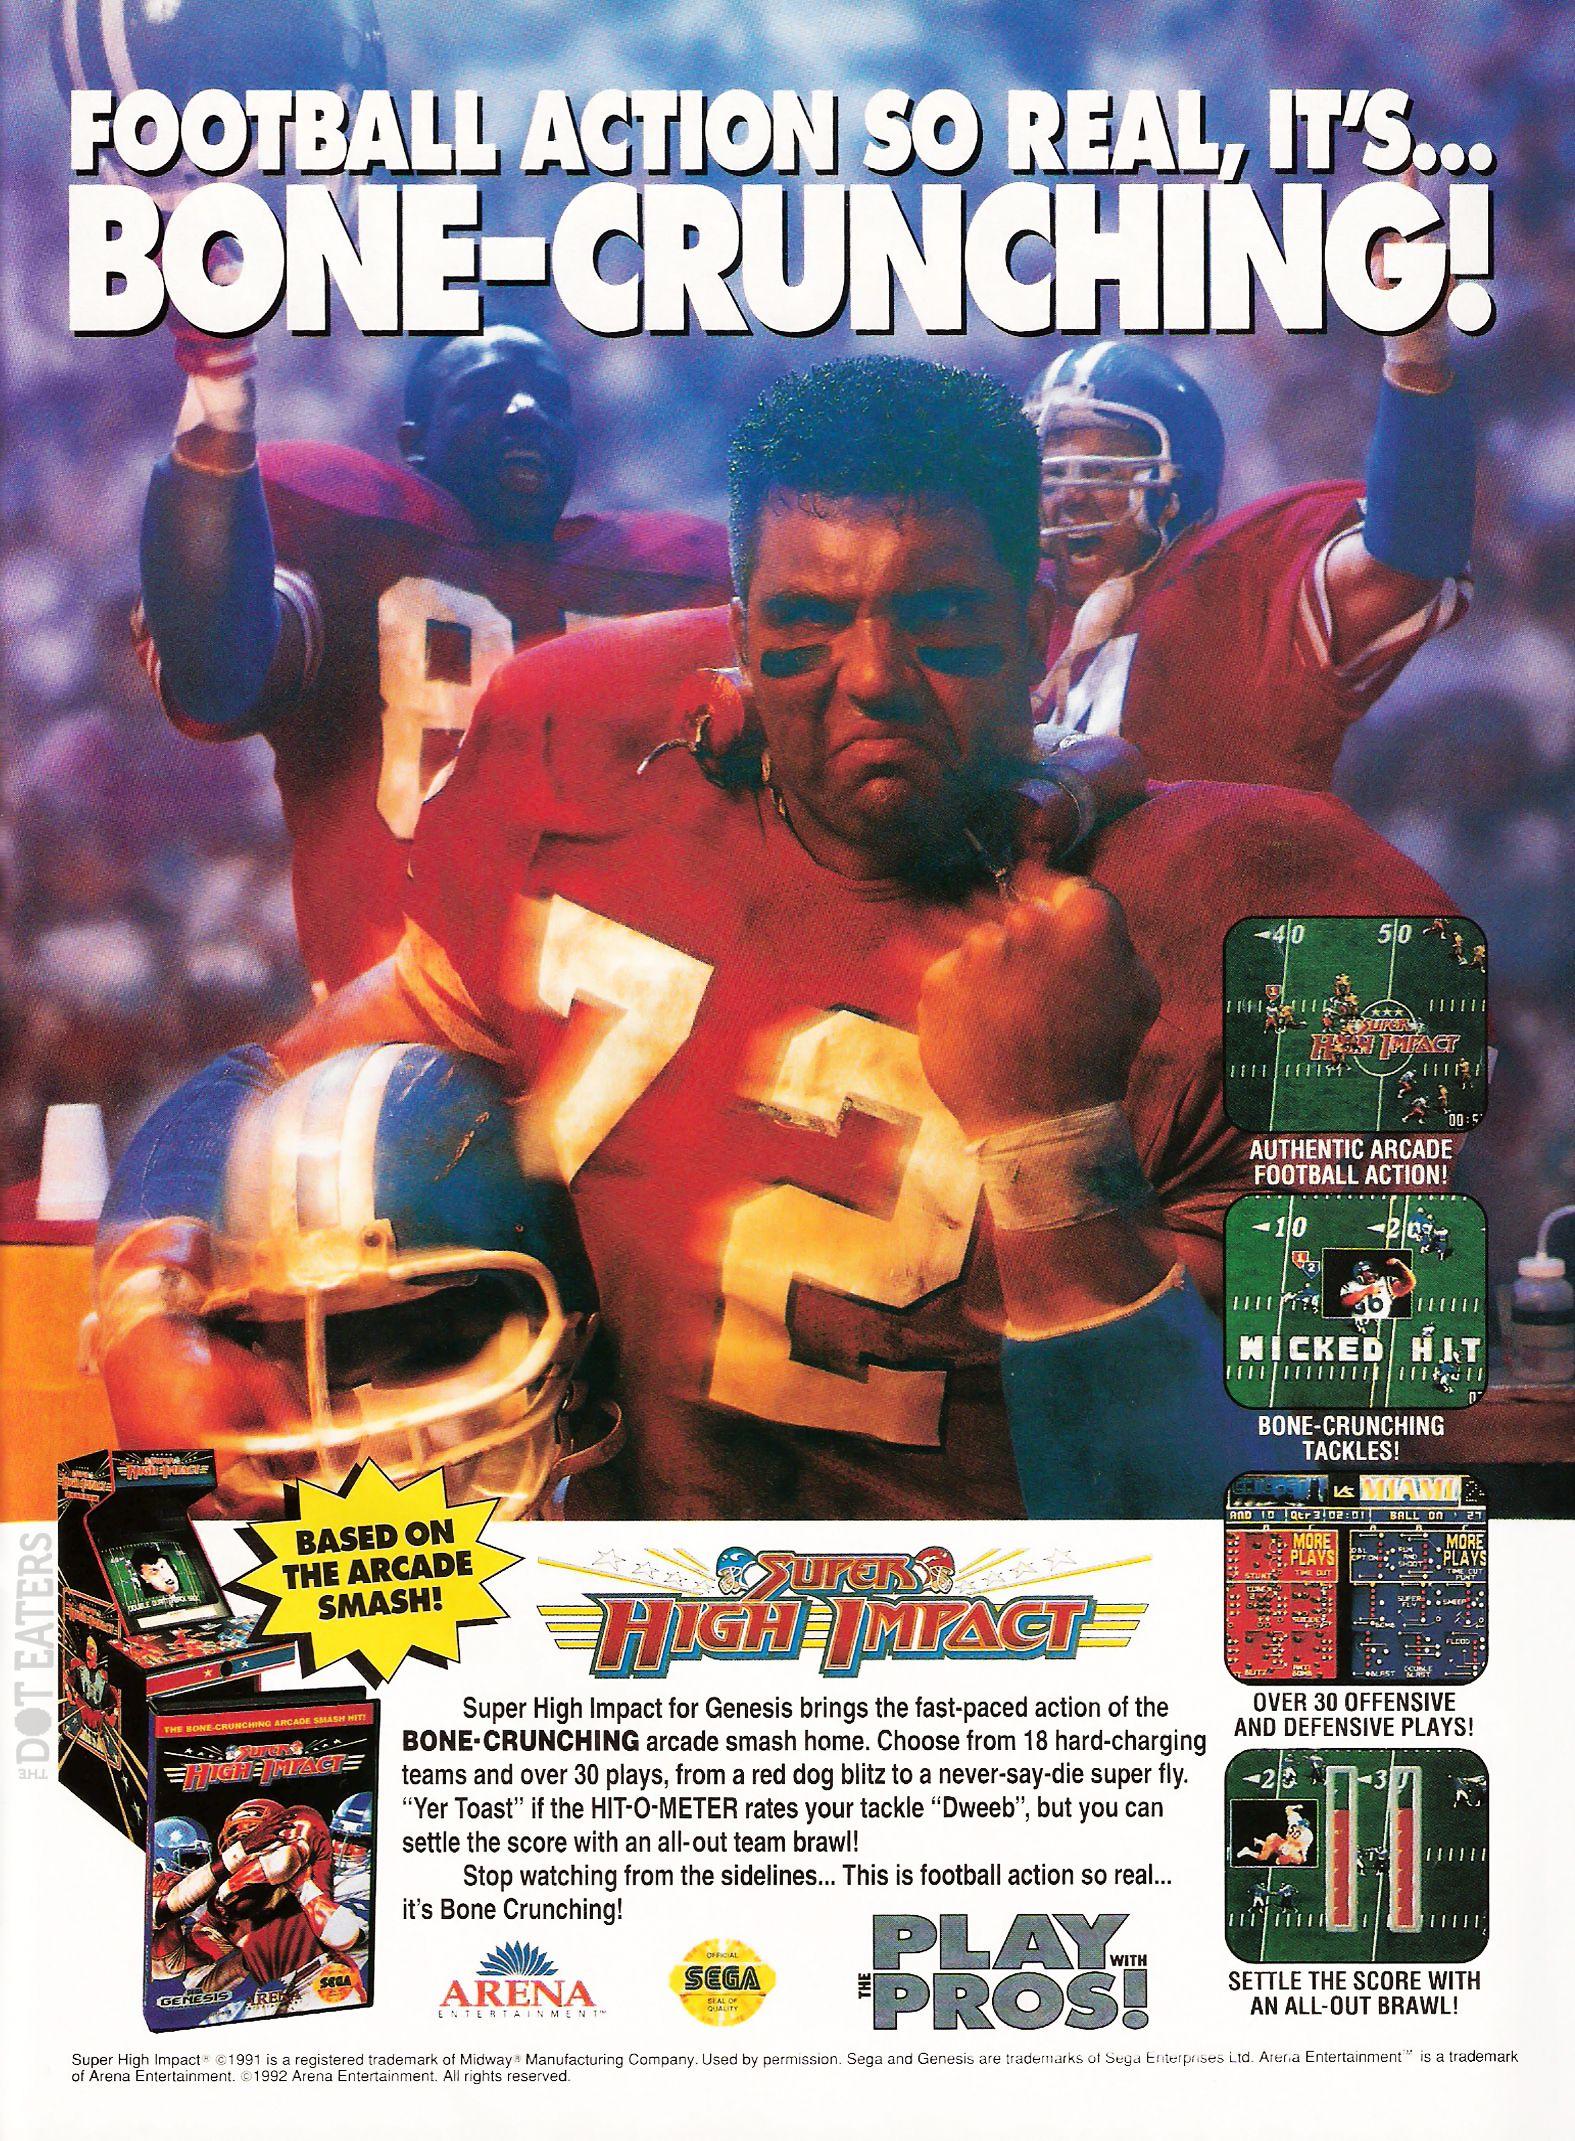 A bonecrunching arcade football game tackles the genesis